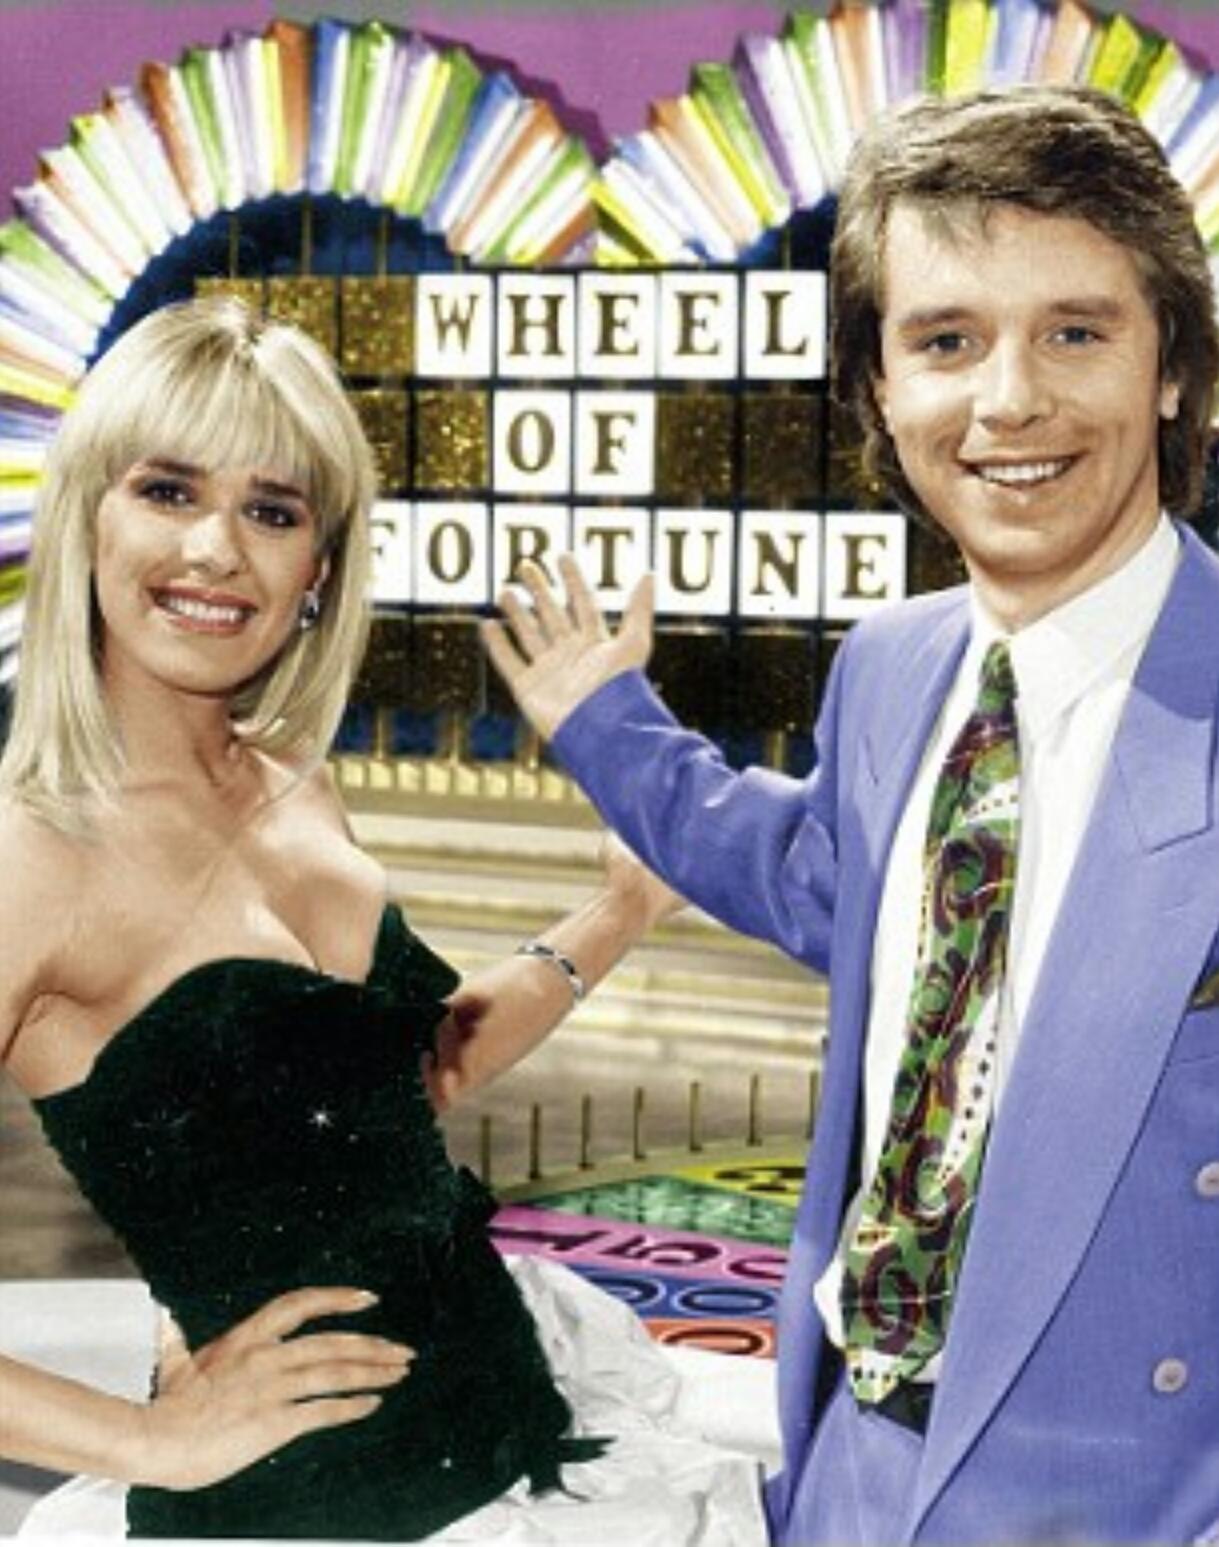 Same Letter Wheel Of Fortune.Wheel Of Fortune Tv Series 1988 2001 Imdb